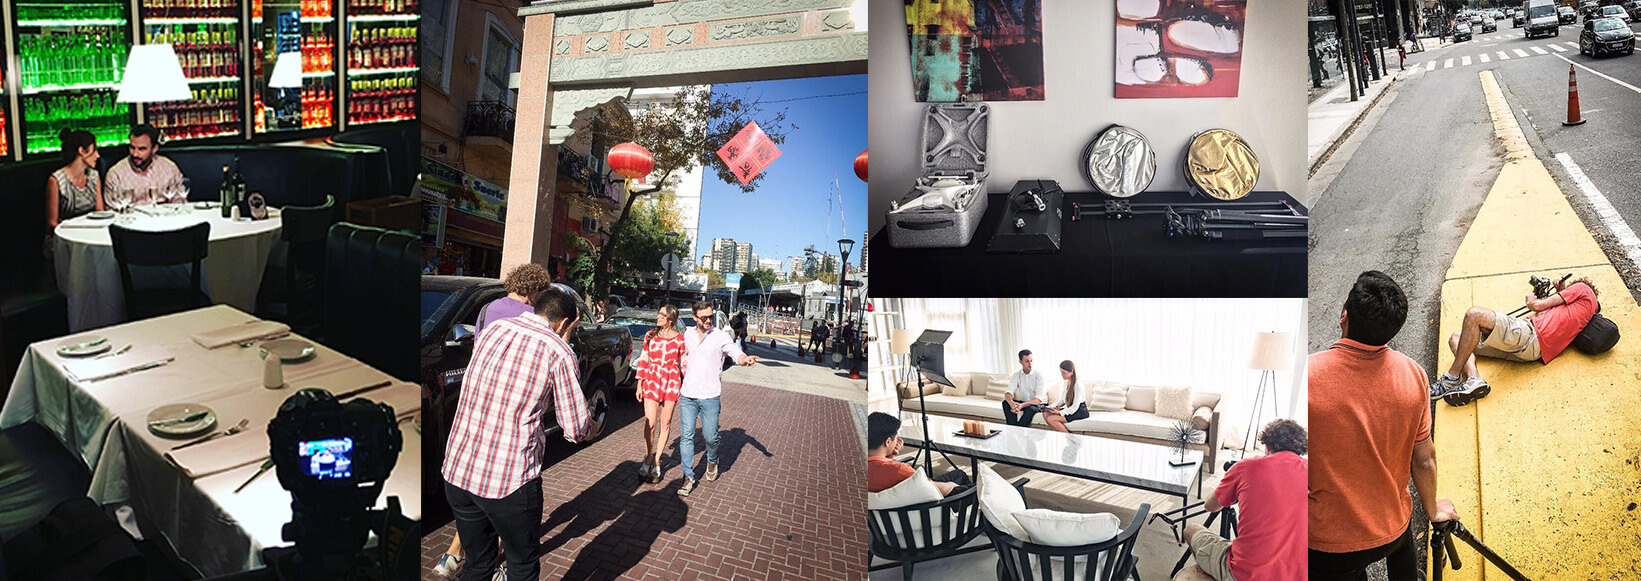 producción fotográfica para hoteles